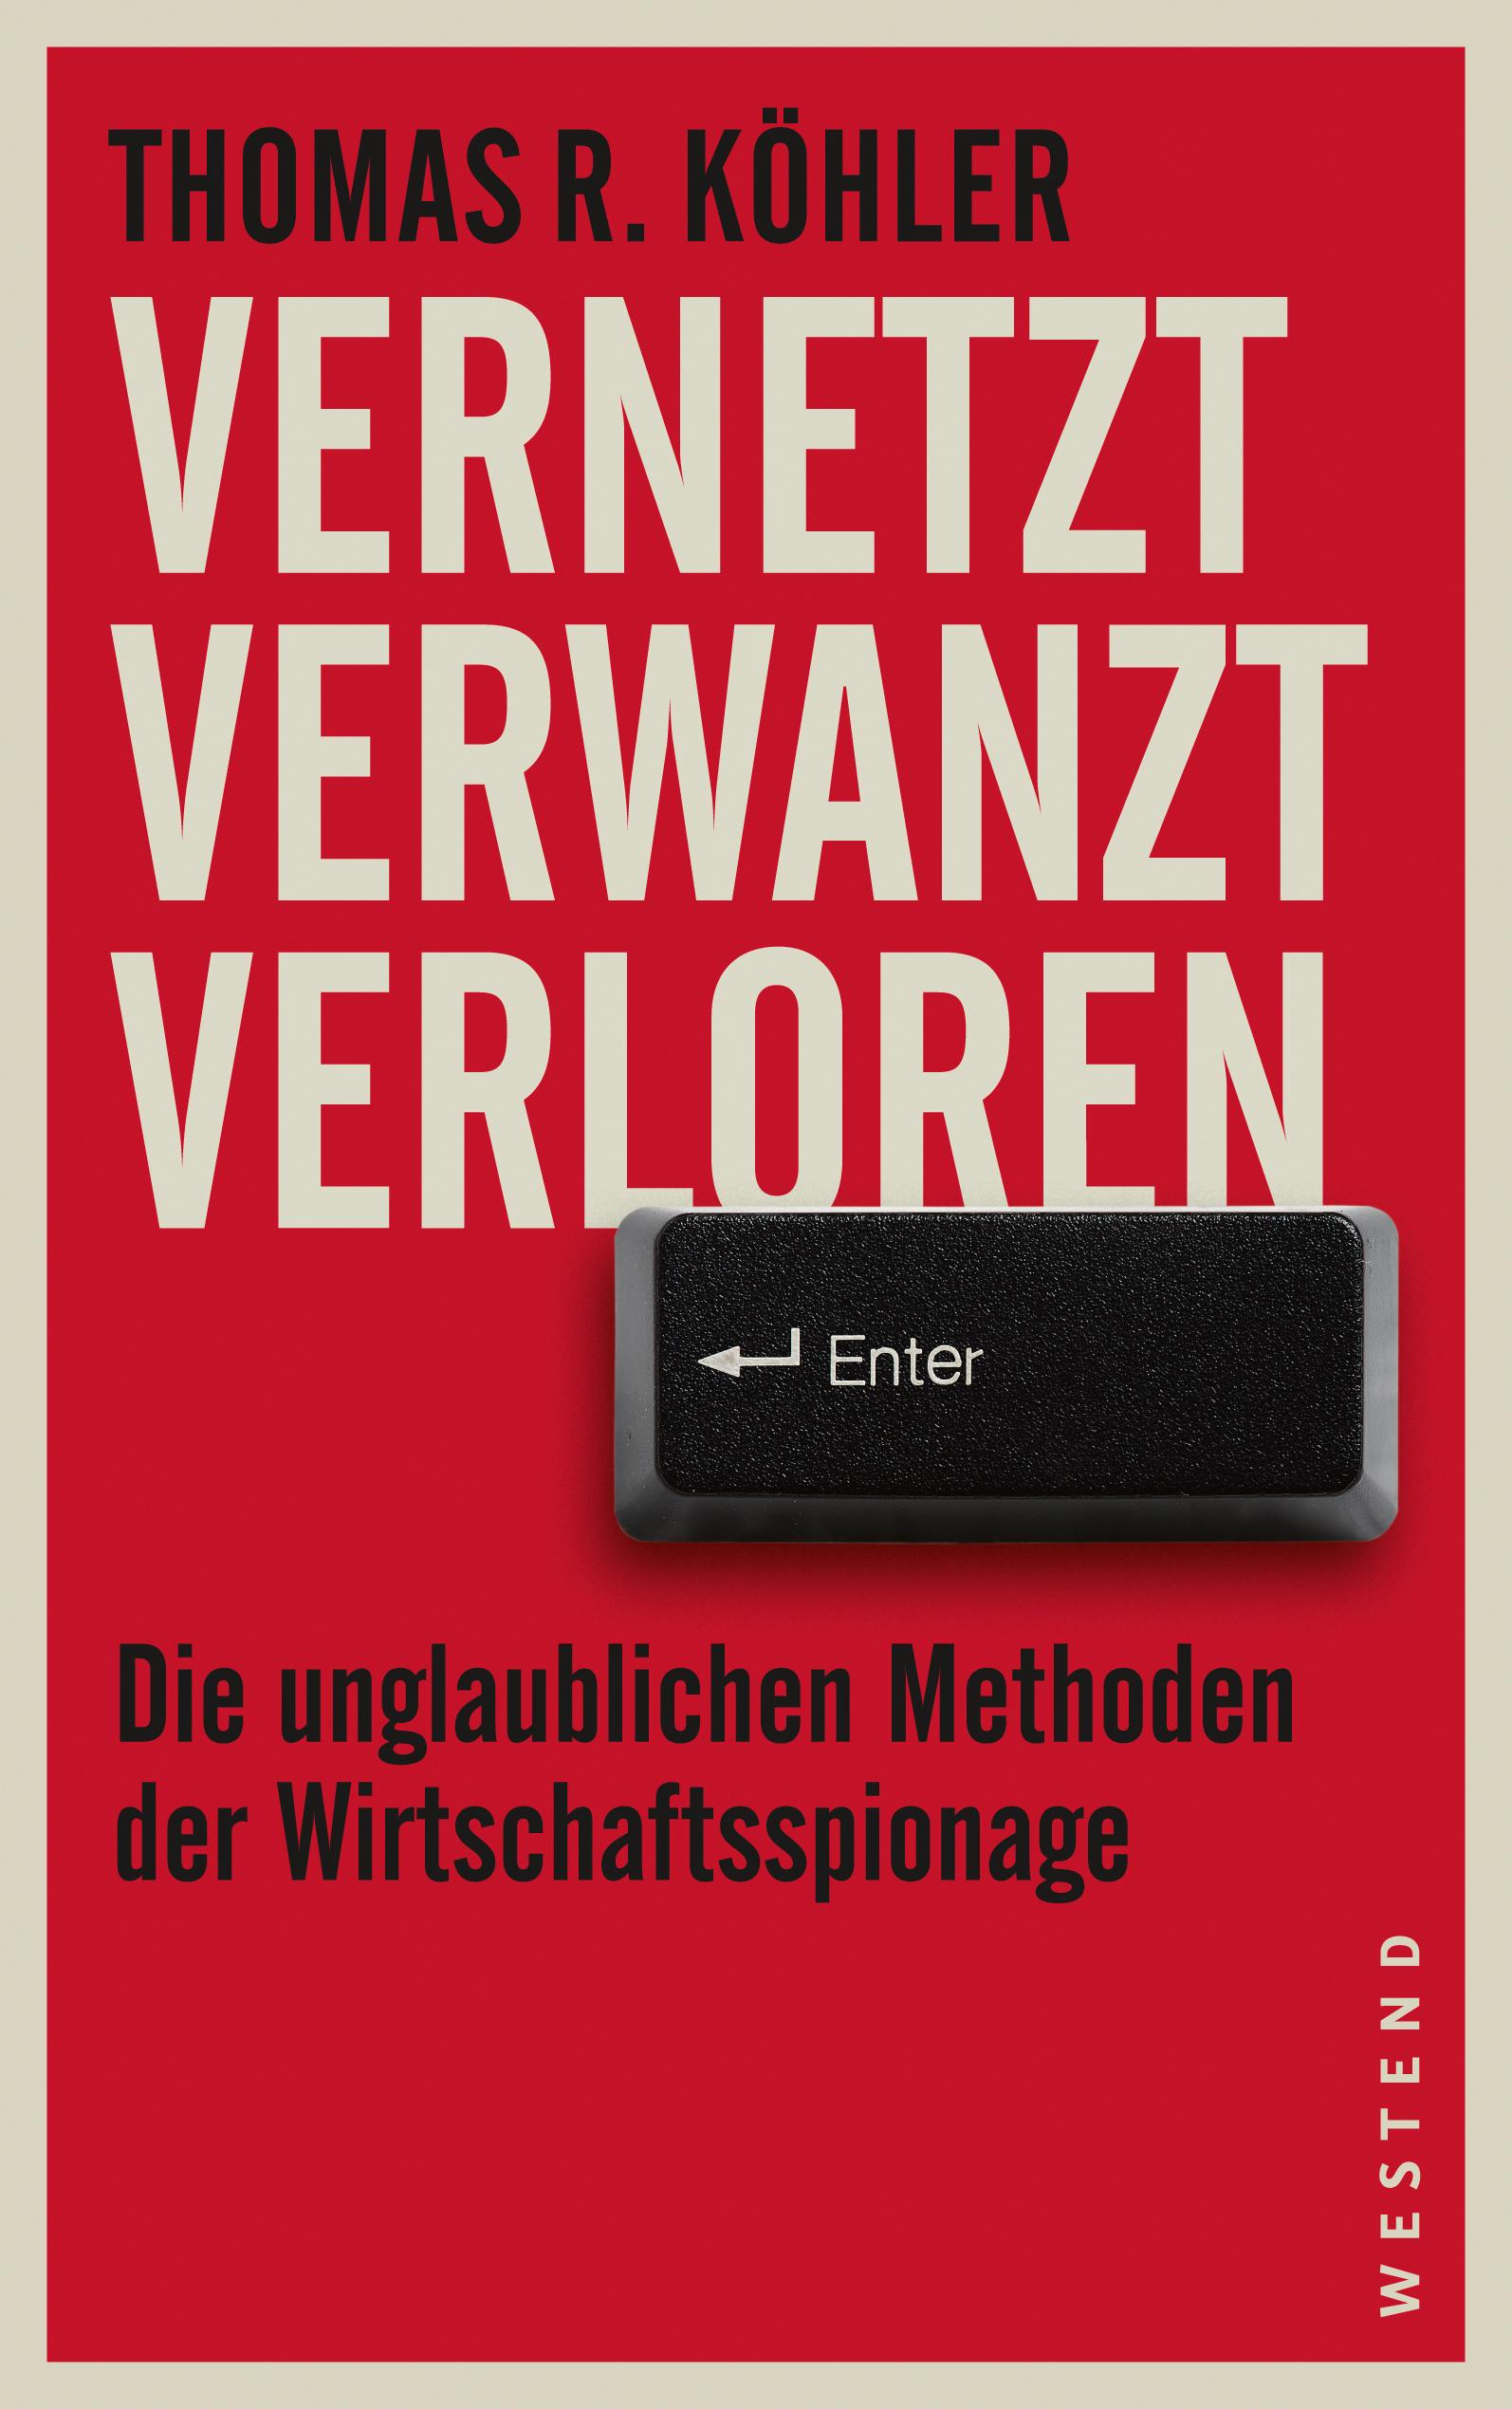 цены Thomas R. Kohler Vernetzt Verwanzt Verloren